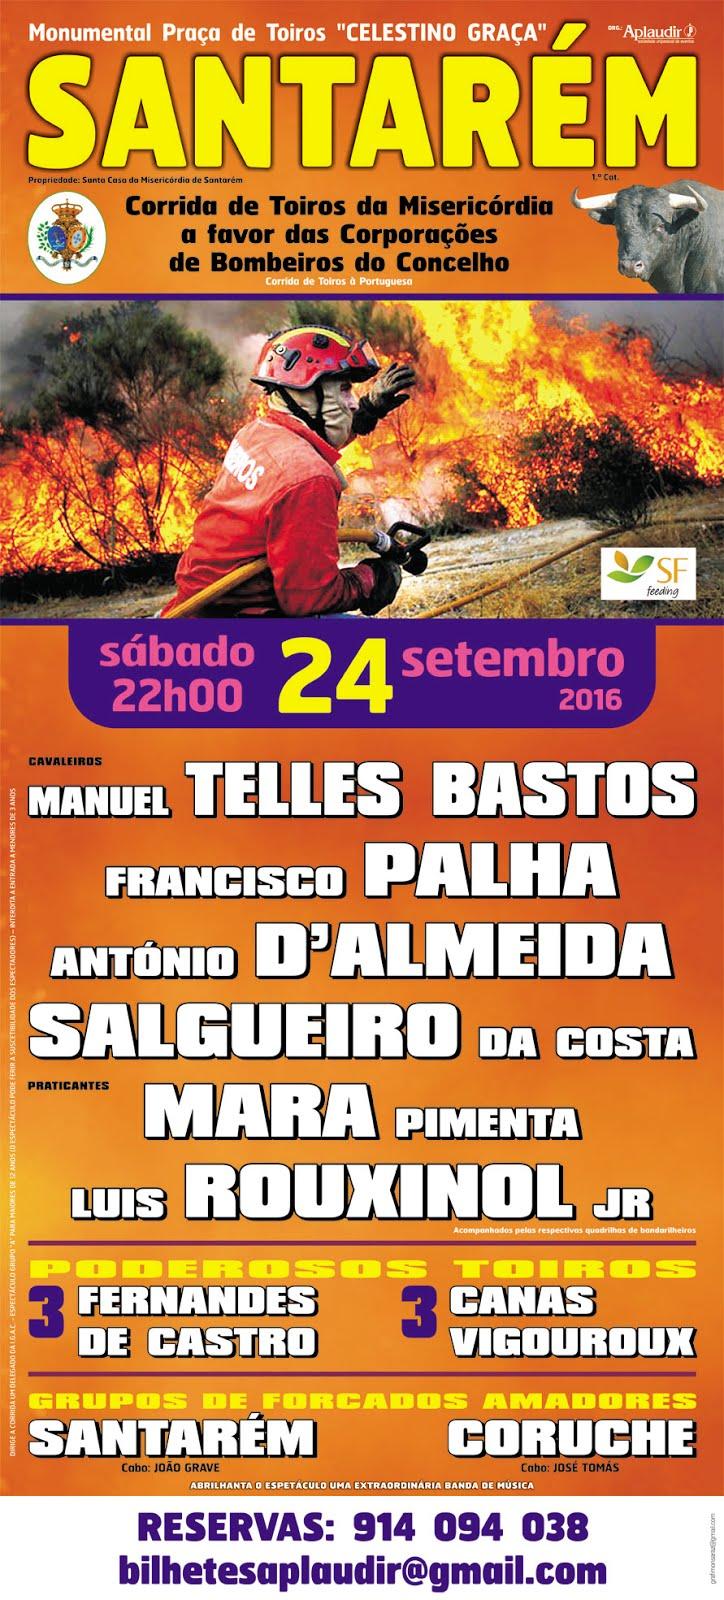 Santarém - 24 Setembro